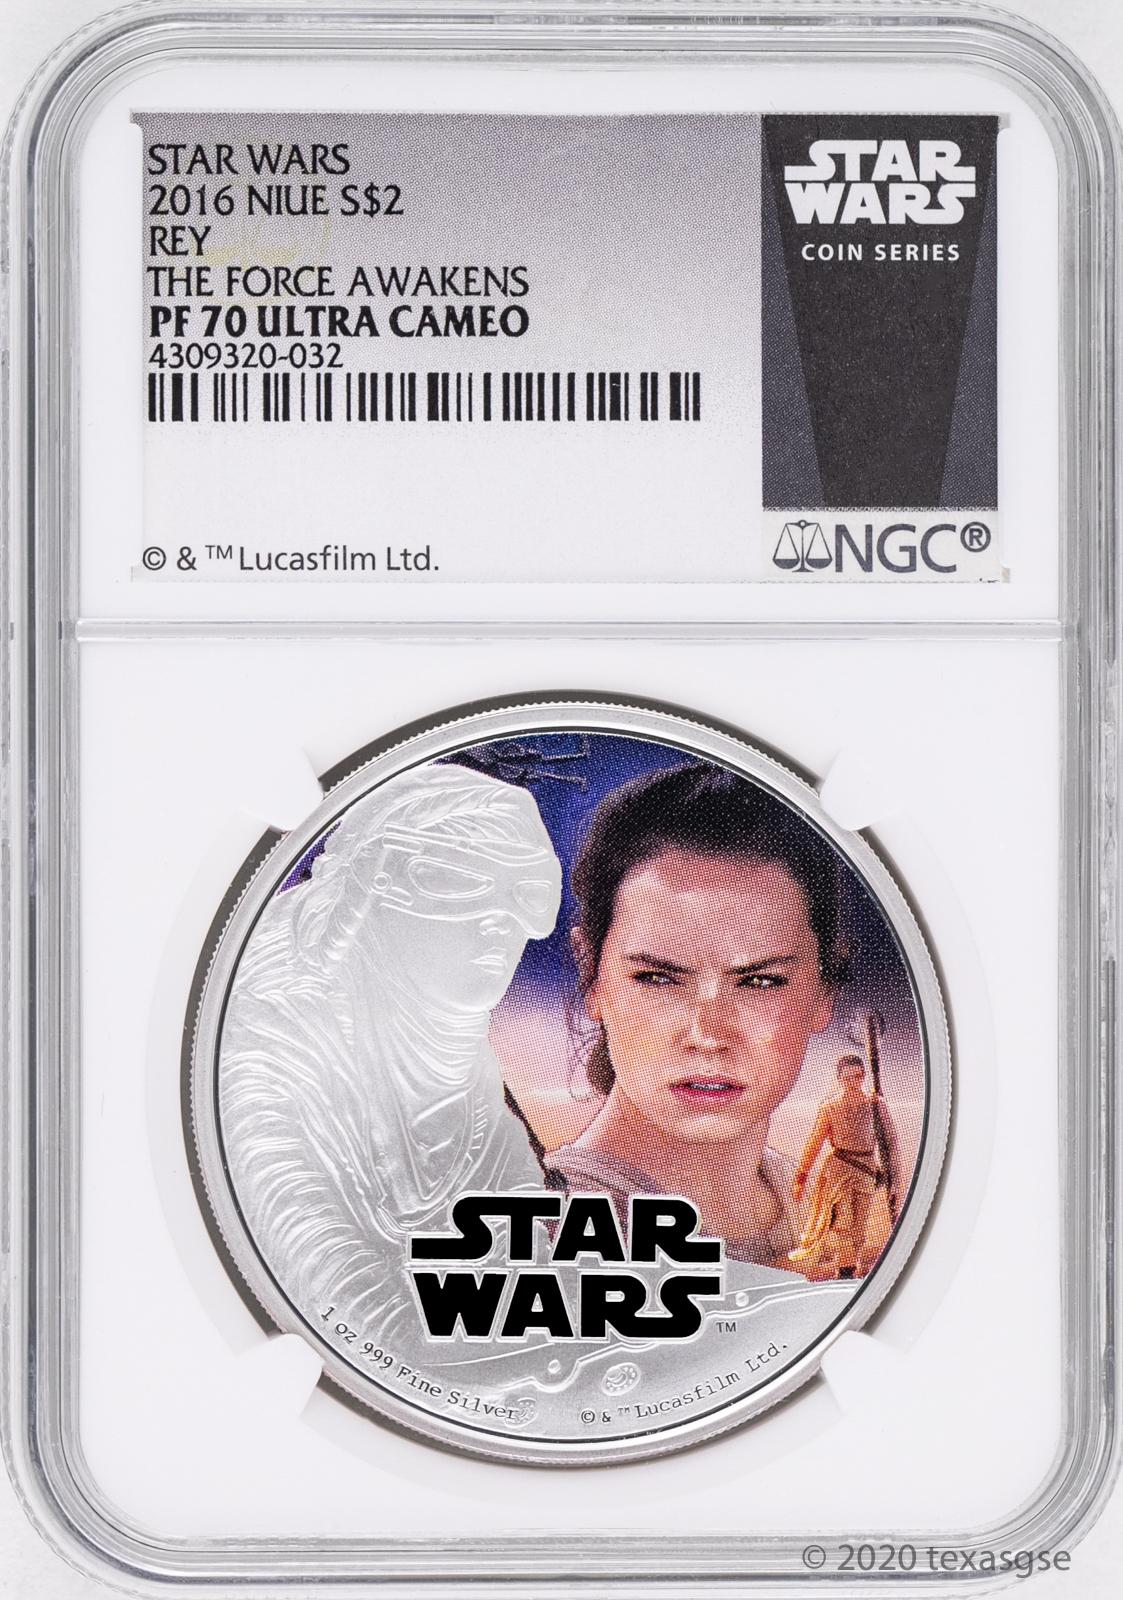 etik ljuv ångest  2016 Niue $2 Star Wars: The Force despierta Rey Moneda de Plata Ngc  PF70-Blanco | eBay